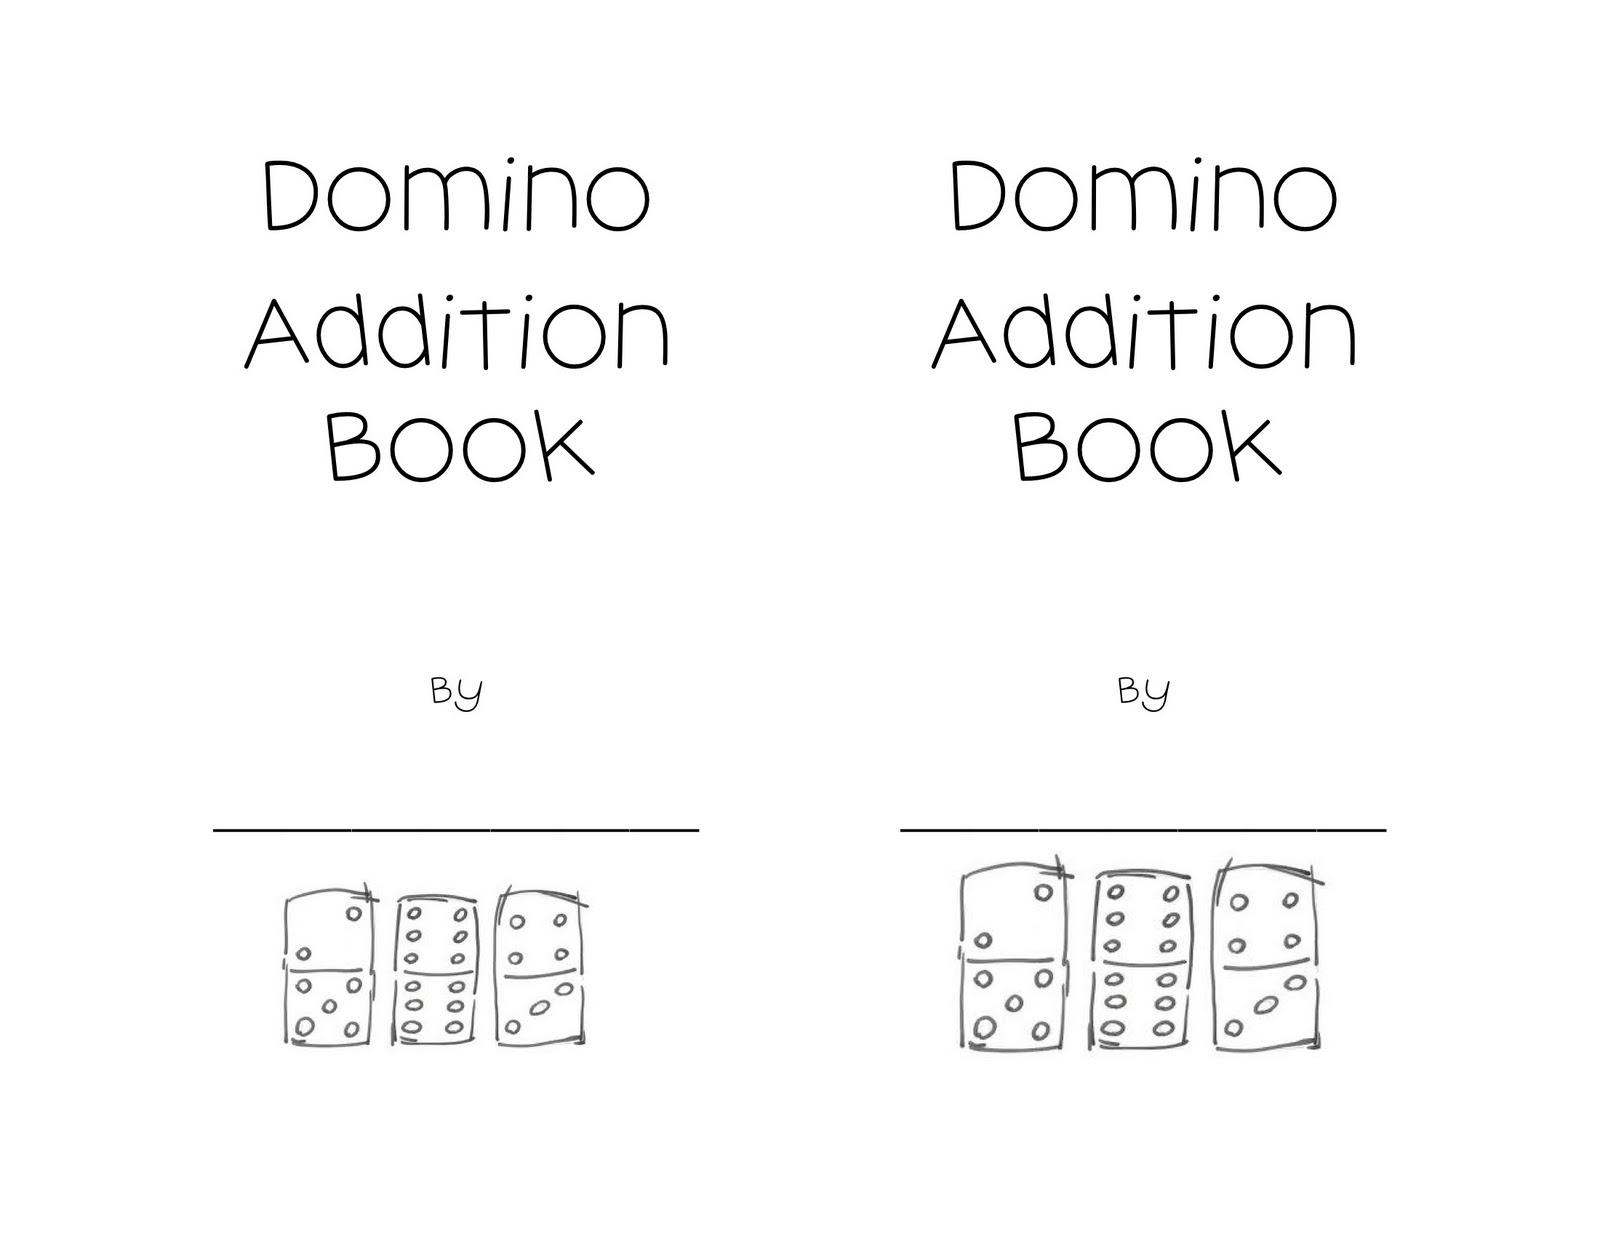 Kindergarten Night Owls Domino Addition Book